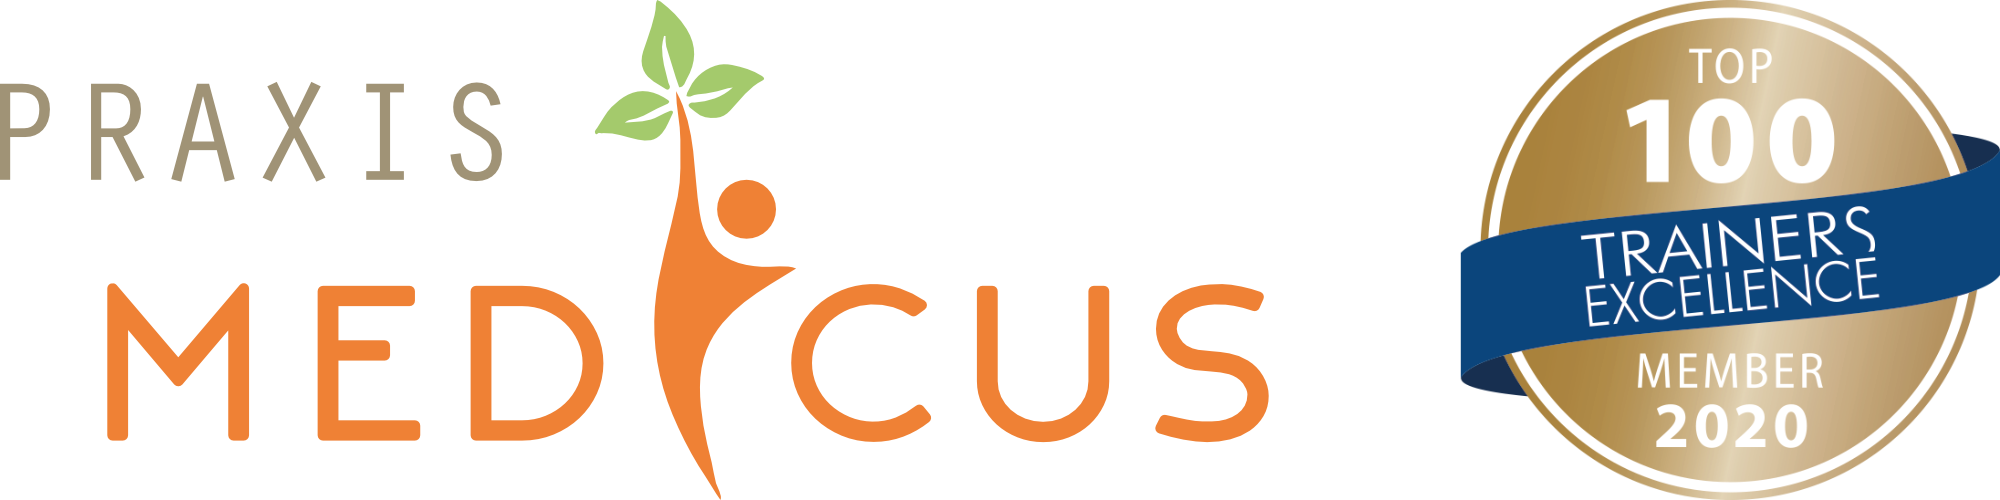 Praxis Medicus